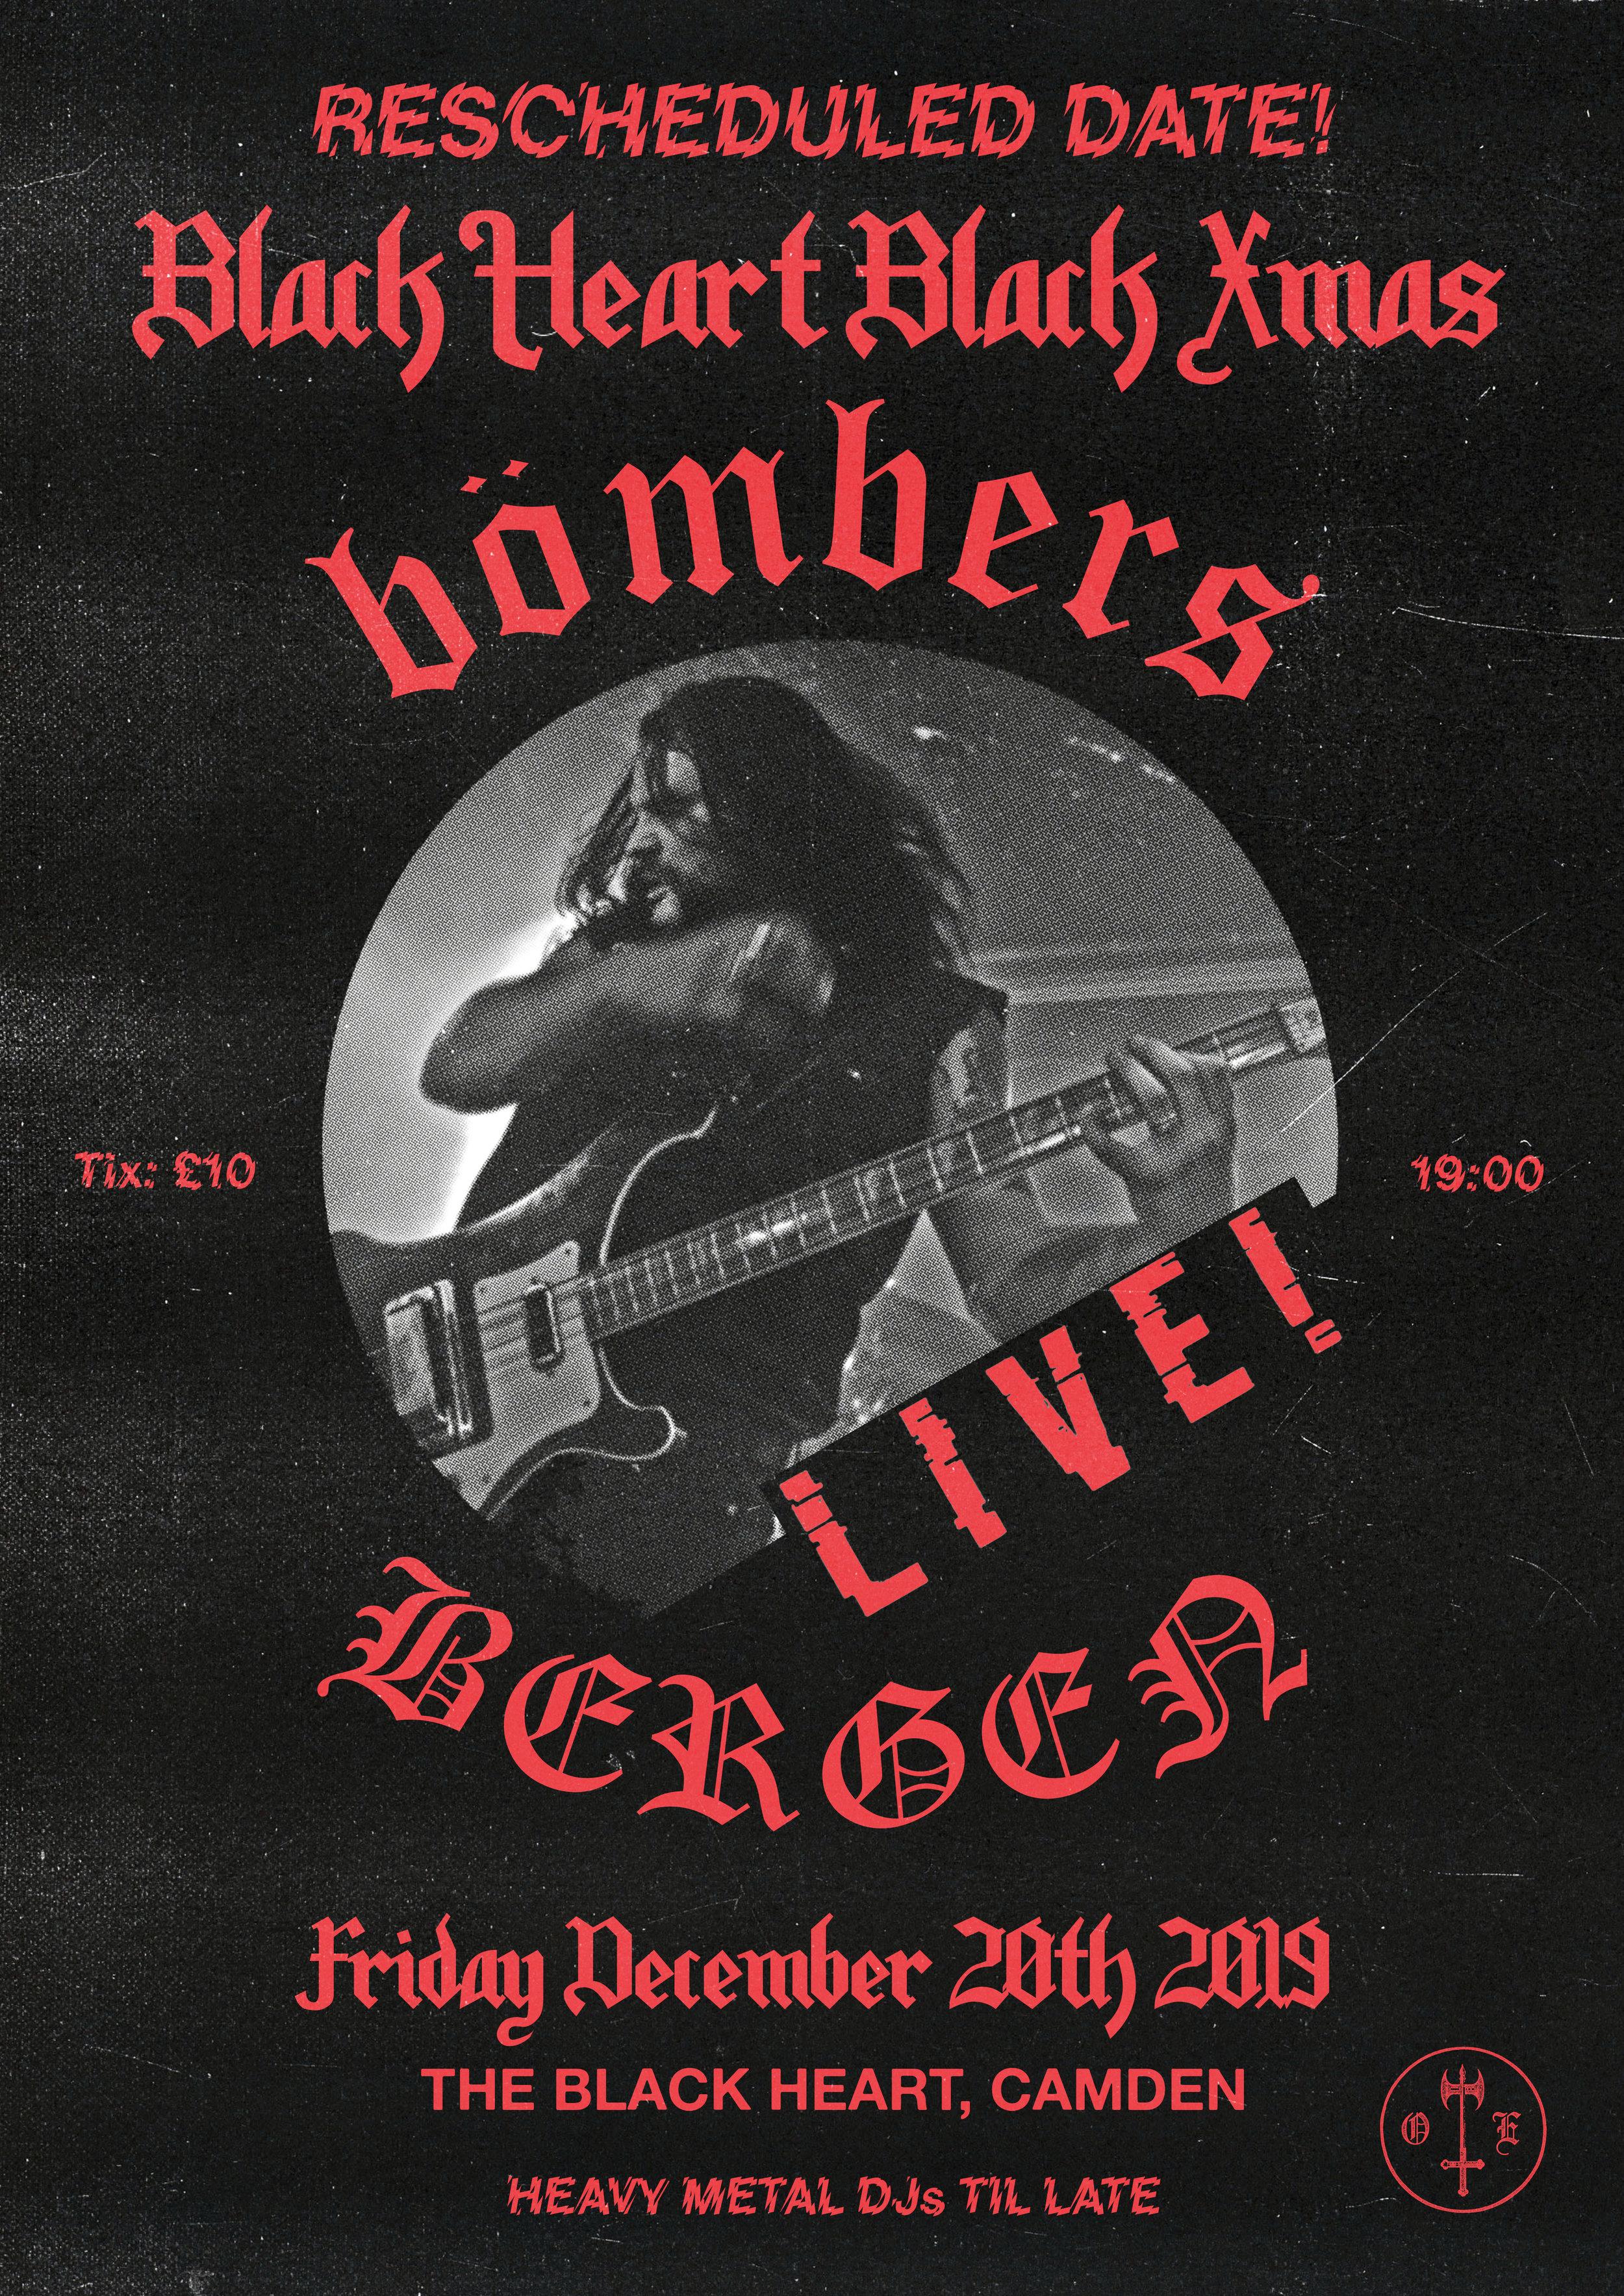 Bombers_black_heart.jpg